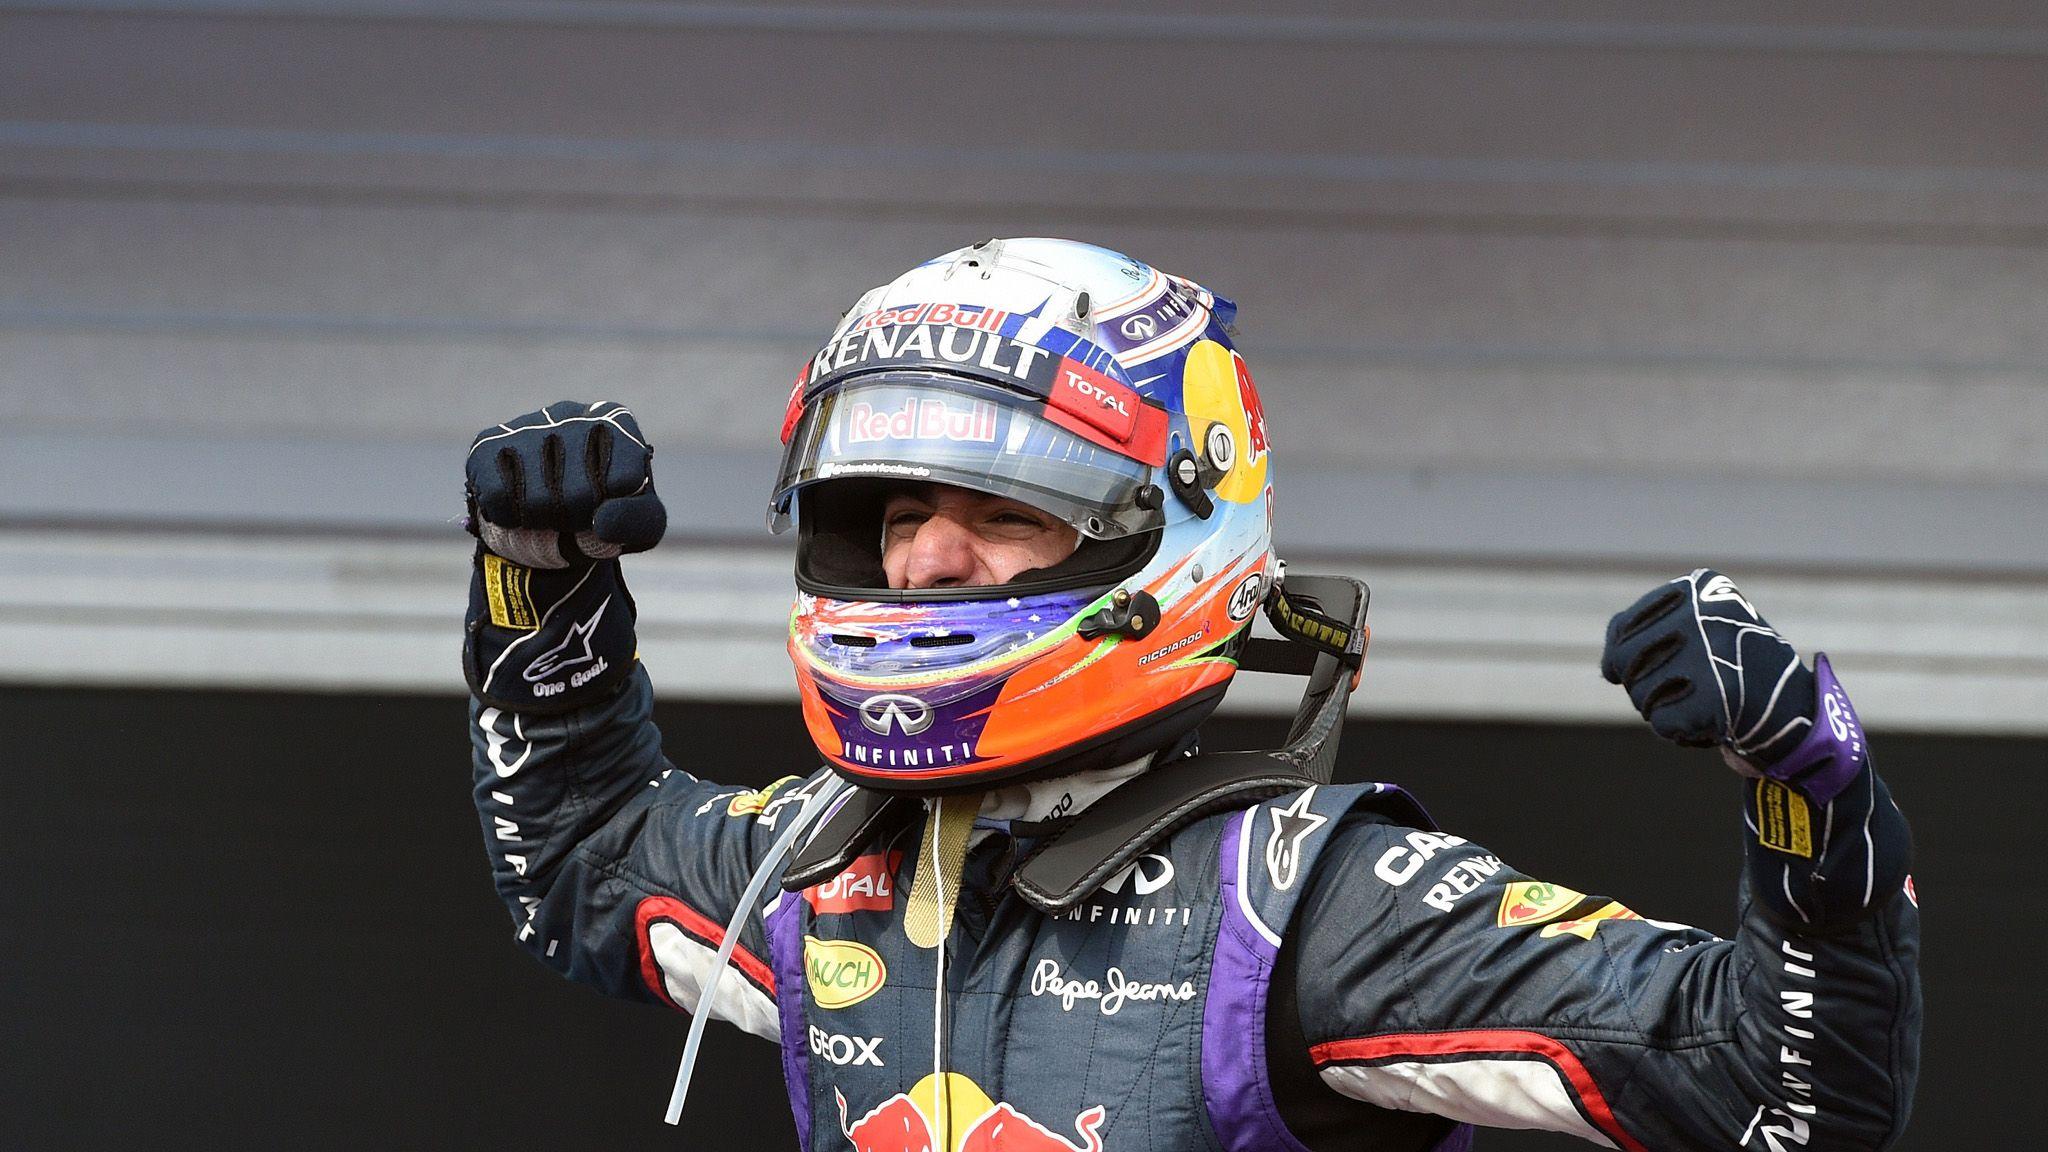 Daniel Ricciardo says the F1 title isn't out of reach